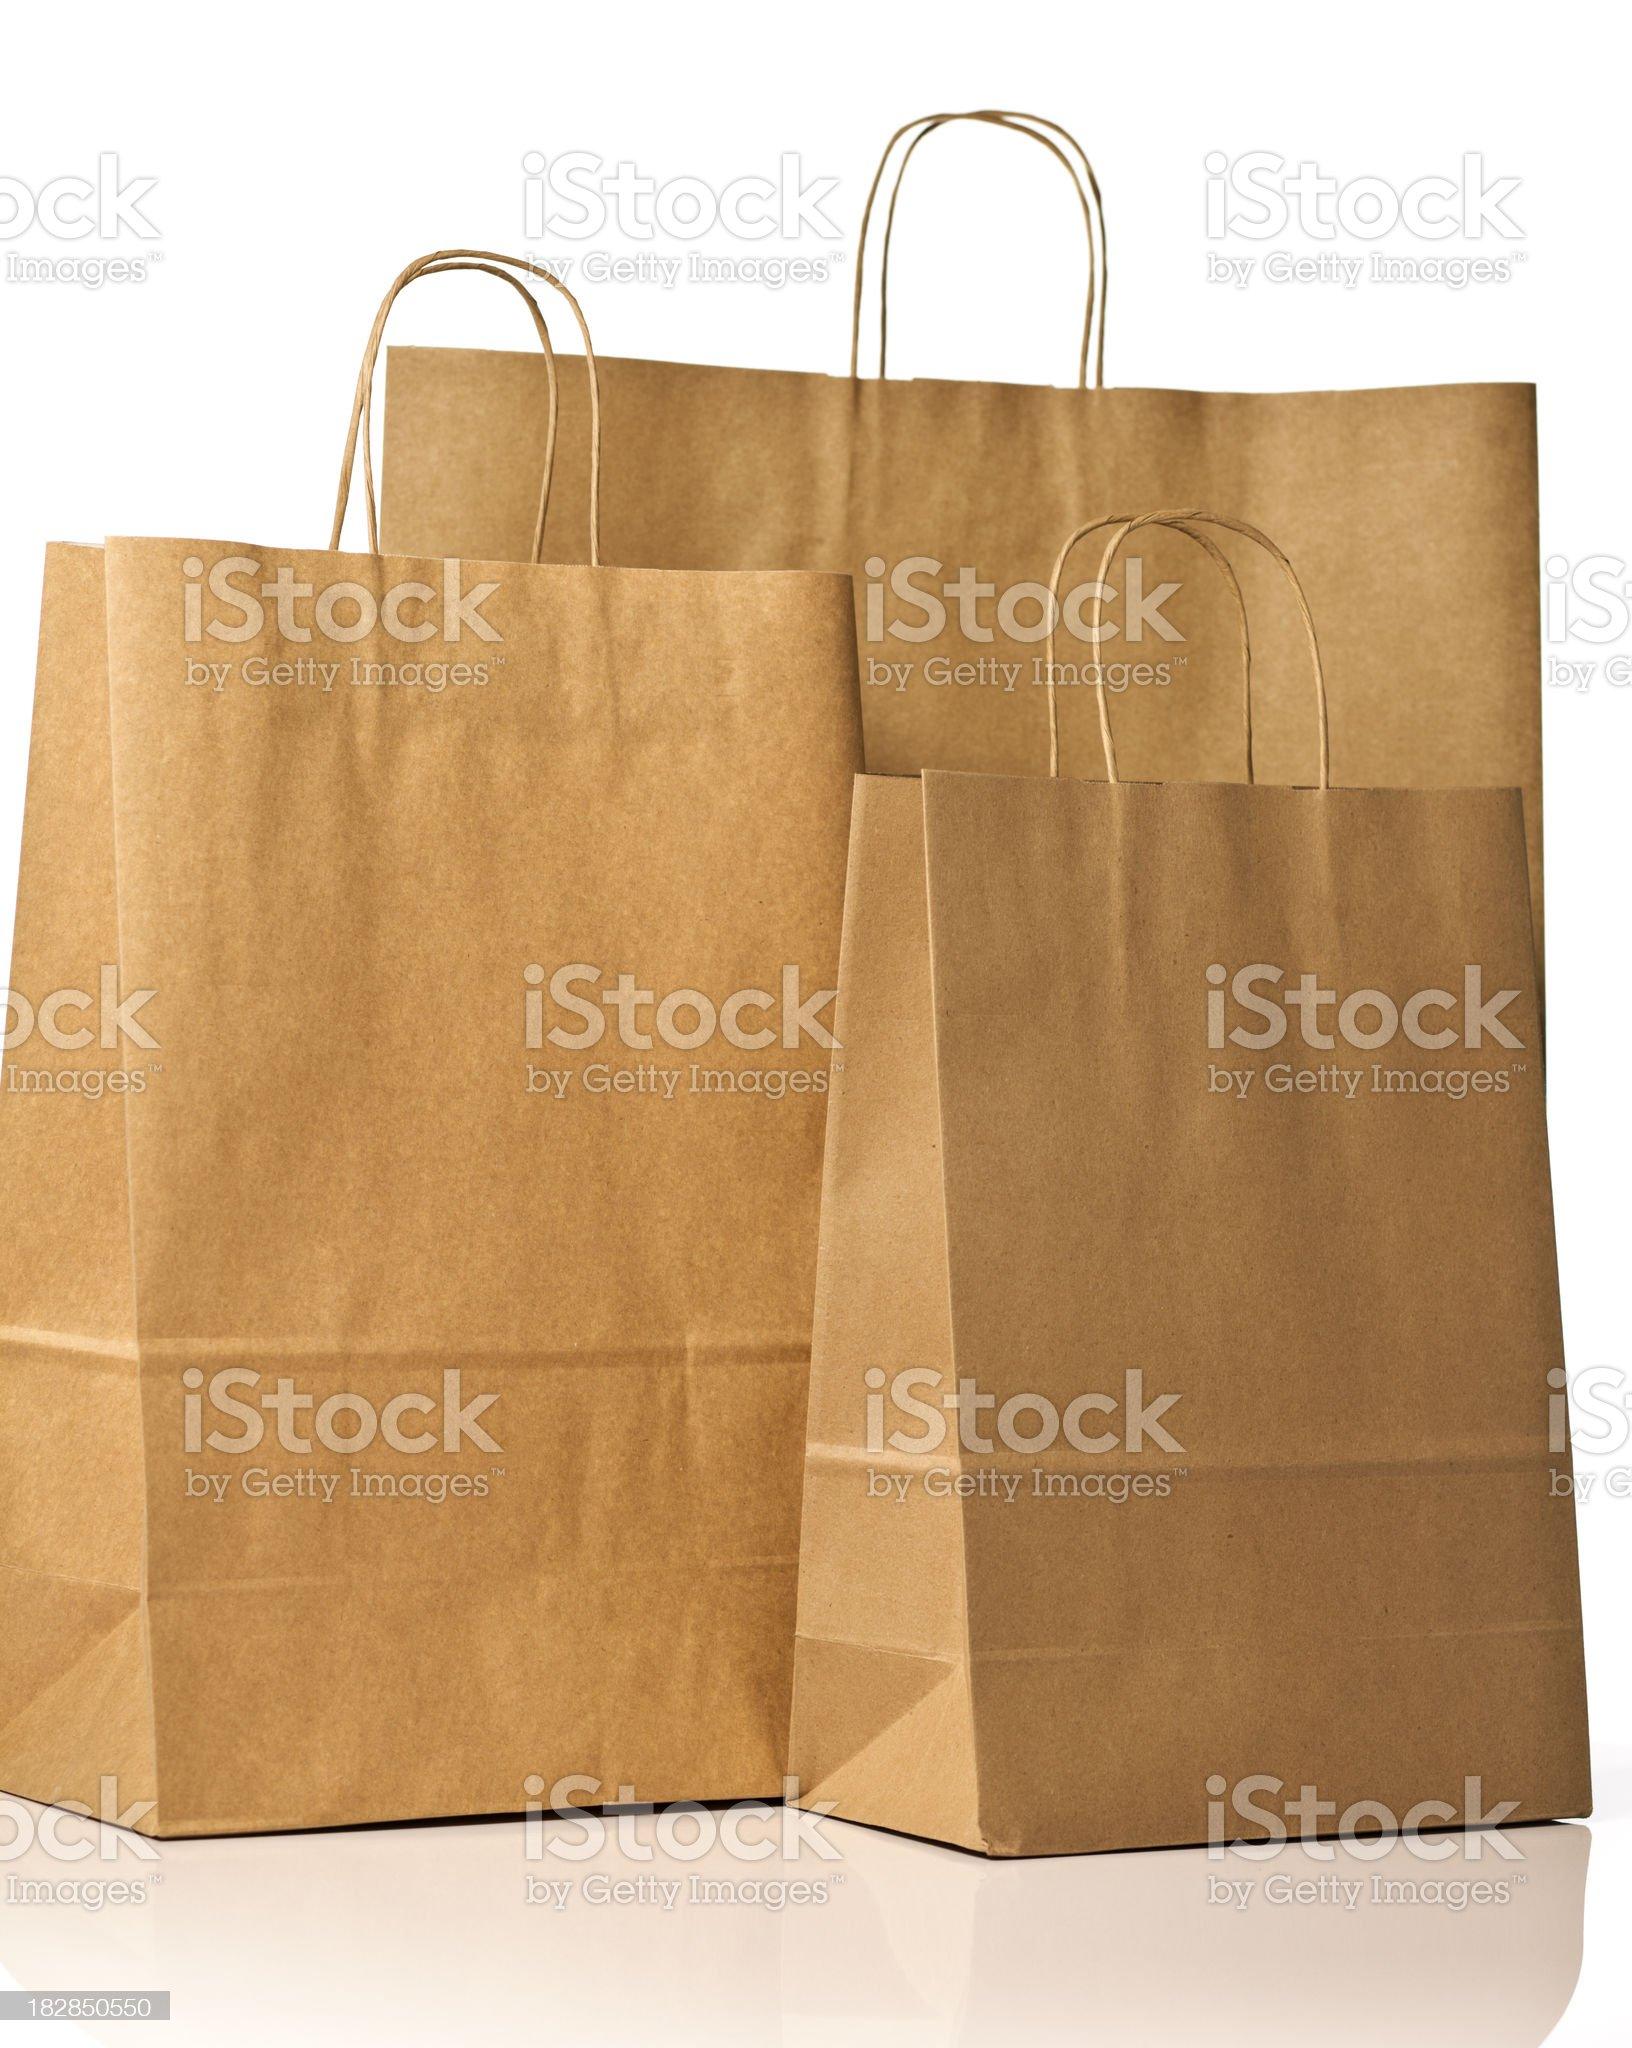 Brown paper shopping bag. royalty-free stock photo